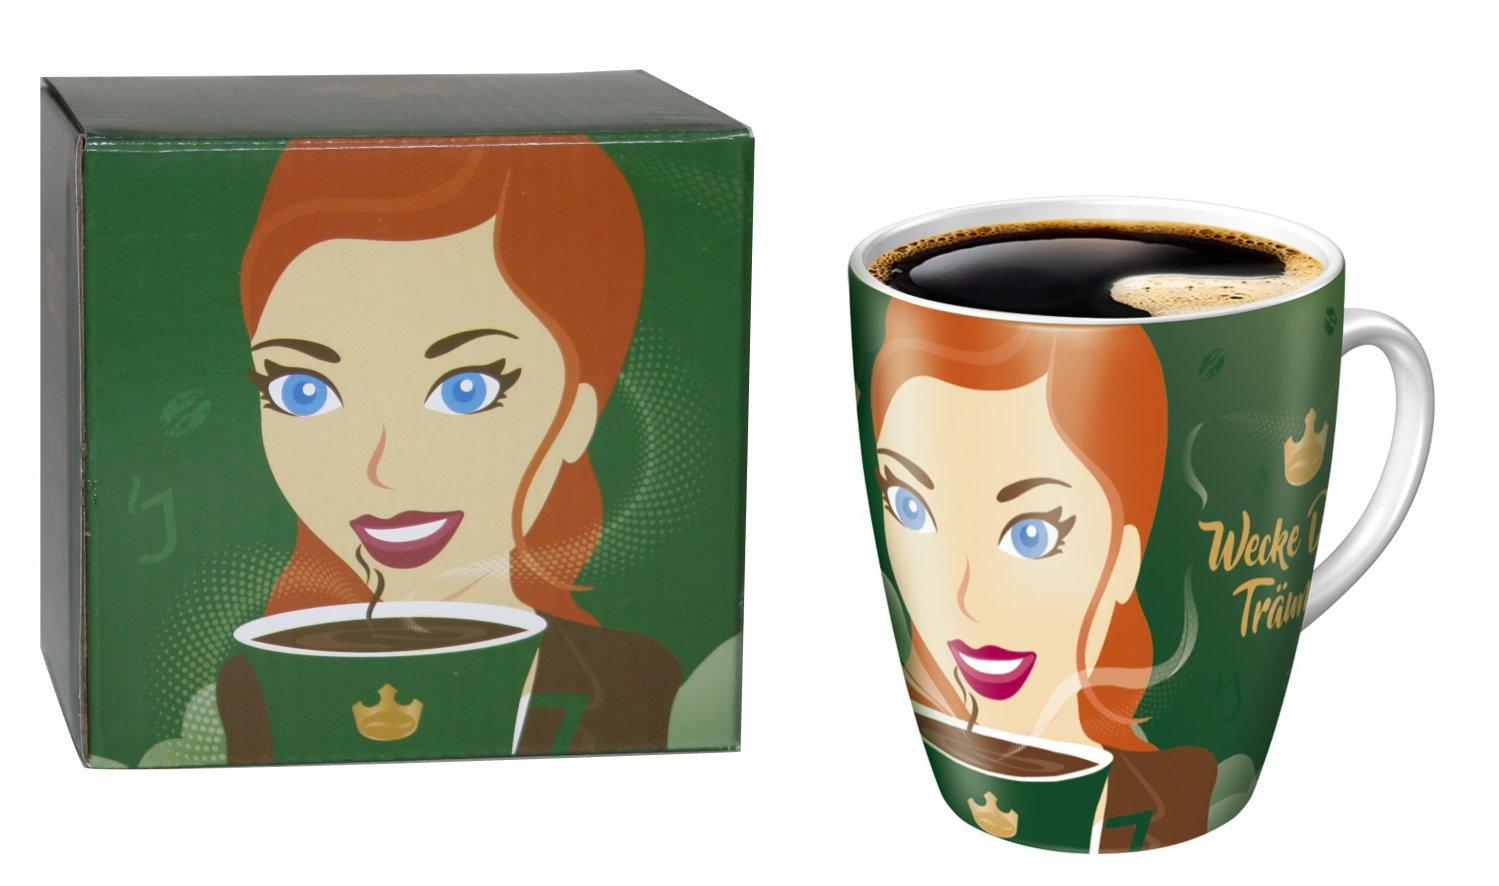 Edition Neu Kaffee Jacobs Krönung Ritzenhoff Tasse Sammeltasse Tasse Becher 14